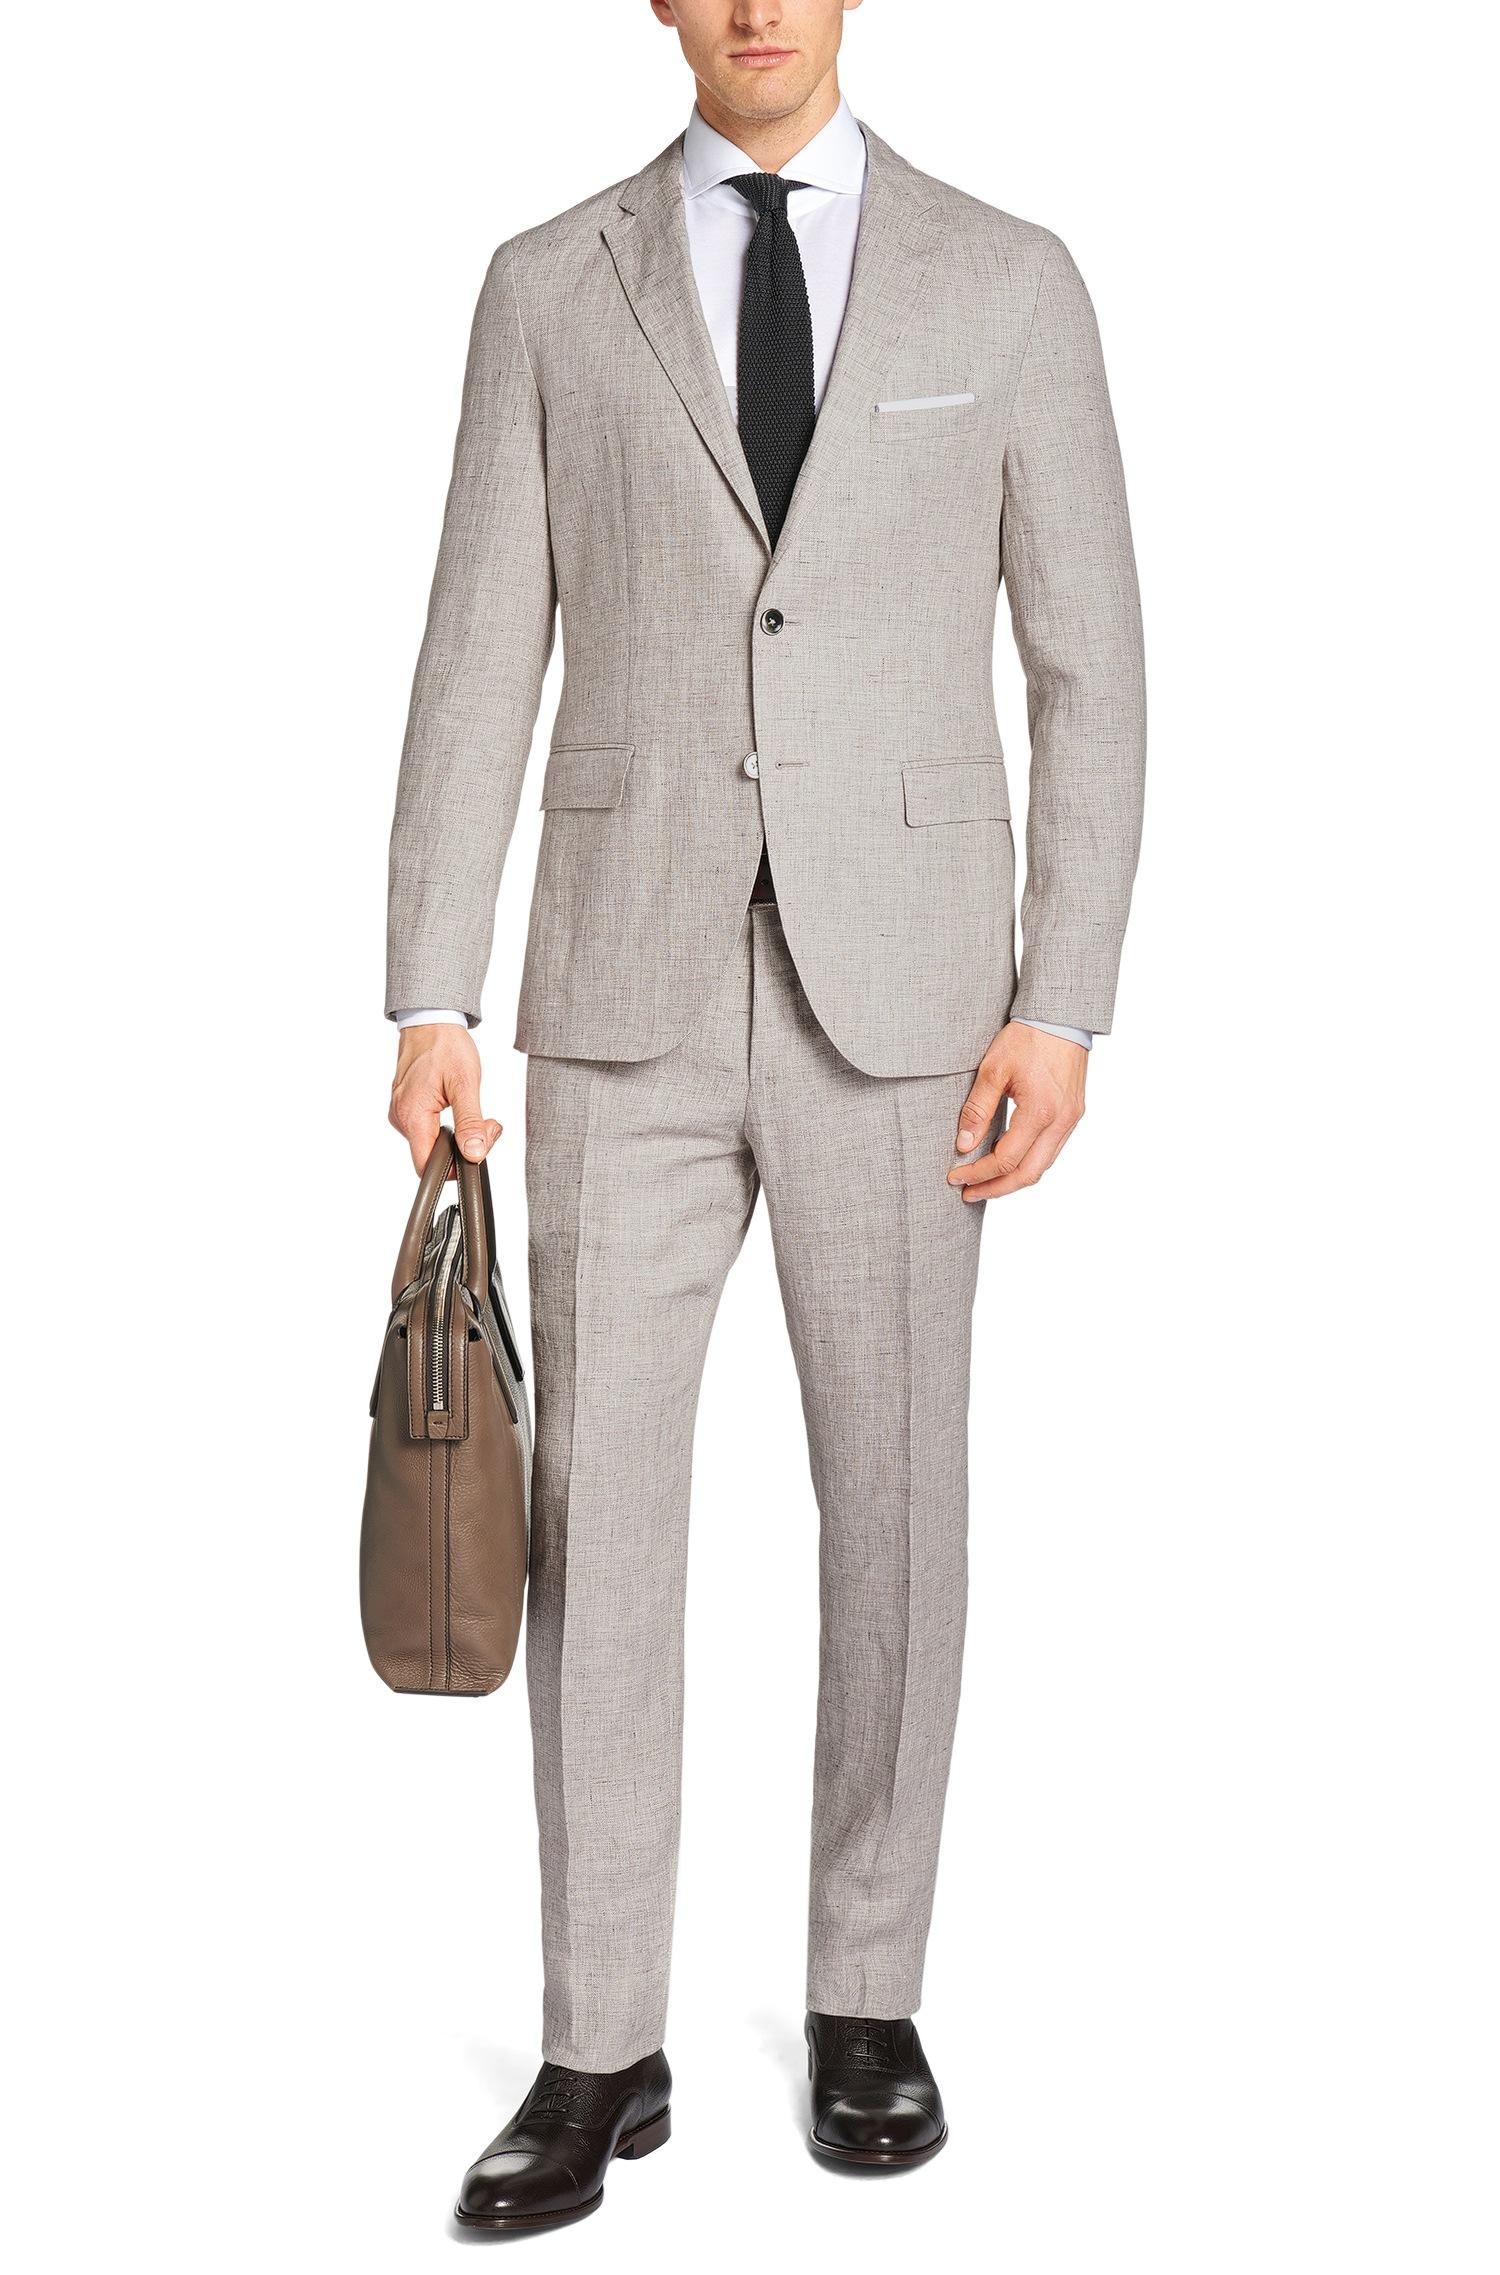 be97e47d BOSS 't-norten/bexter'   Slim Fit, Italian Linen Suit in Natural for ...